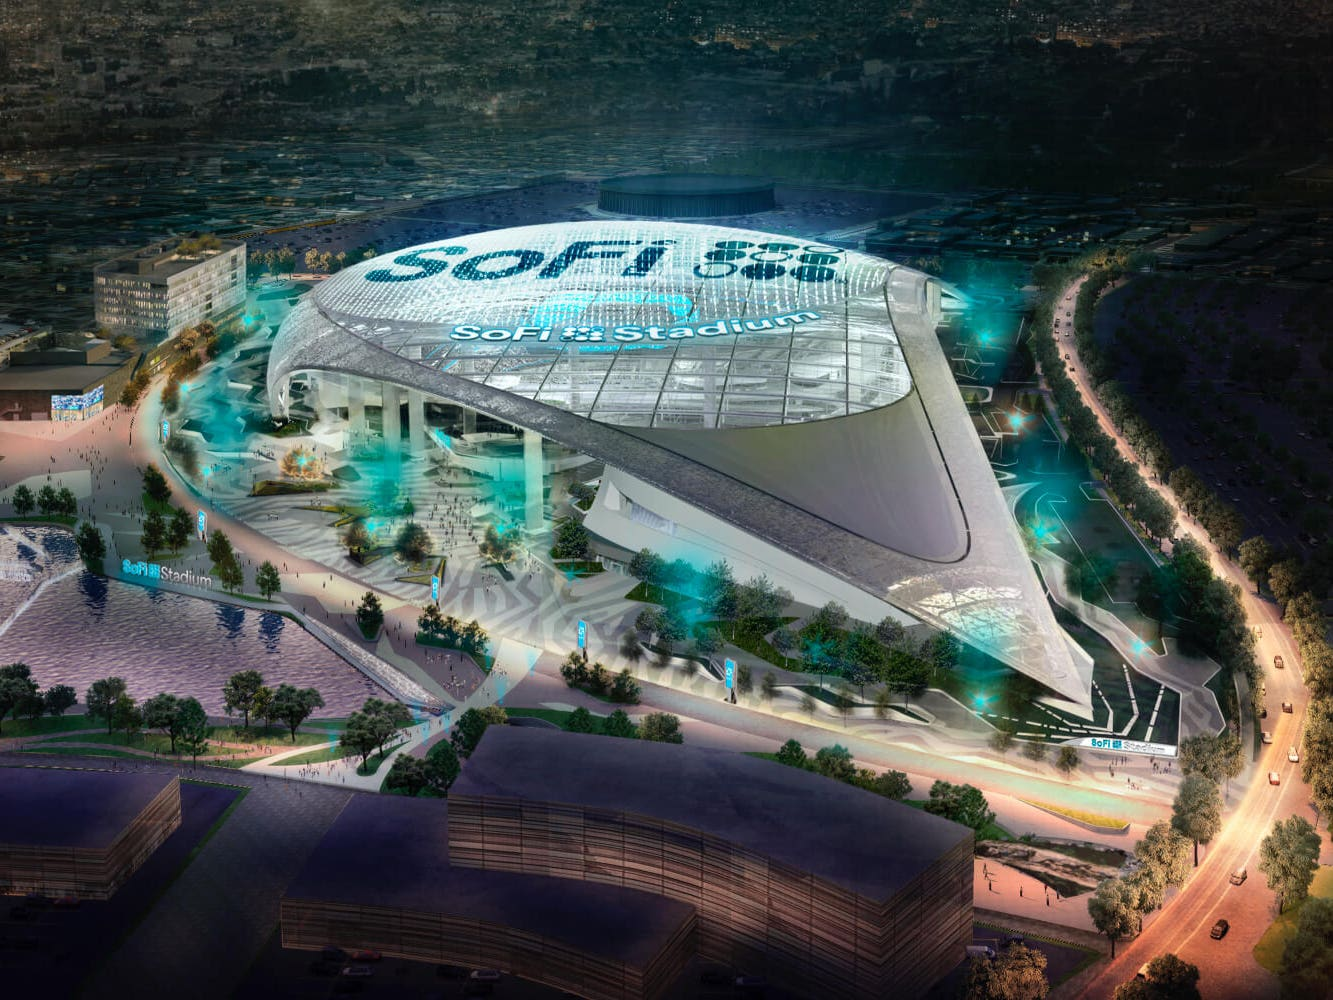 Rendering of SoFi Stadium in Inglewood